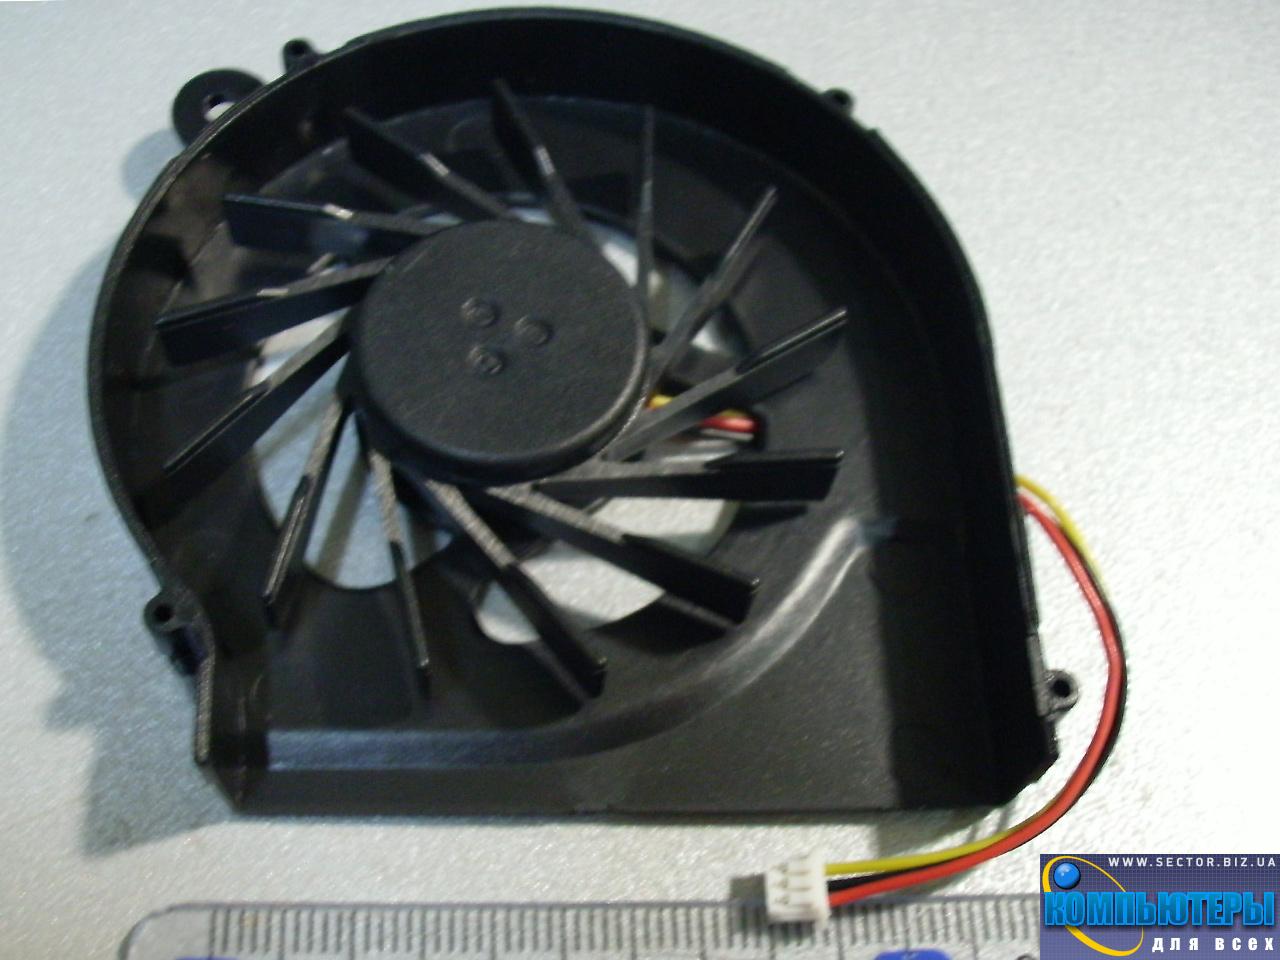 Кулер к ноутбуку HP Compaq CQ42 G42 G4 G6 G7 CQ56 G56 p/n: XS10N05YF05VBJ. Фото № 2.